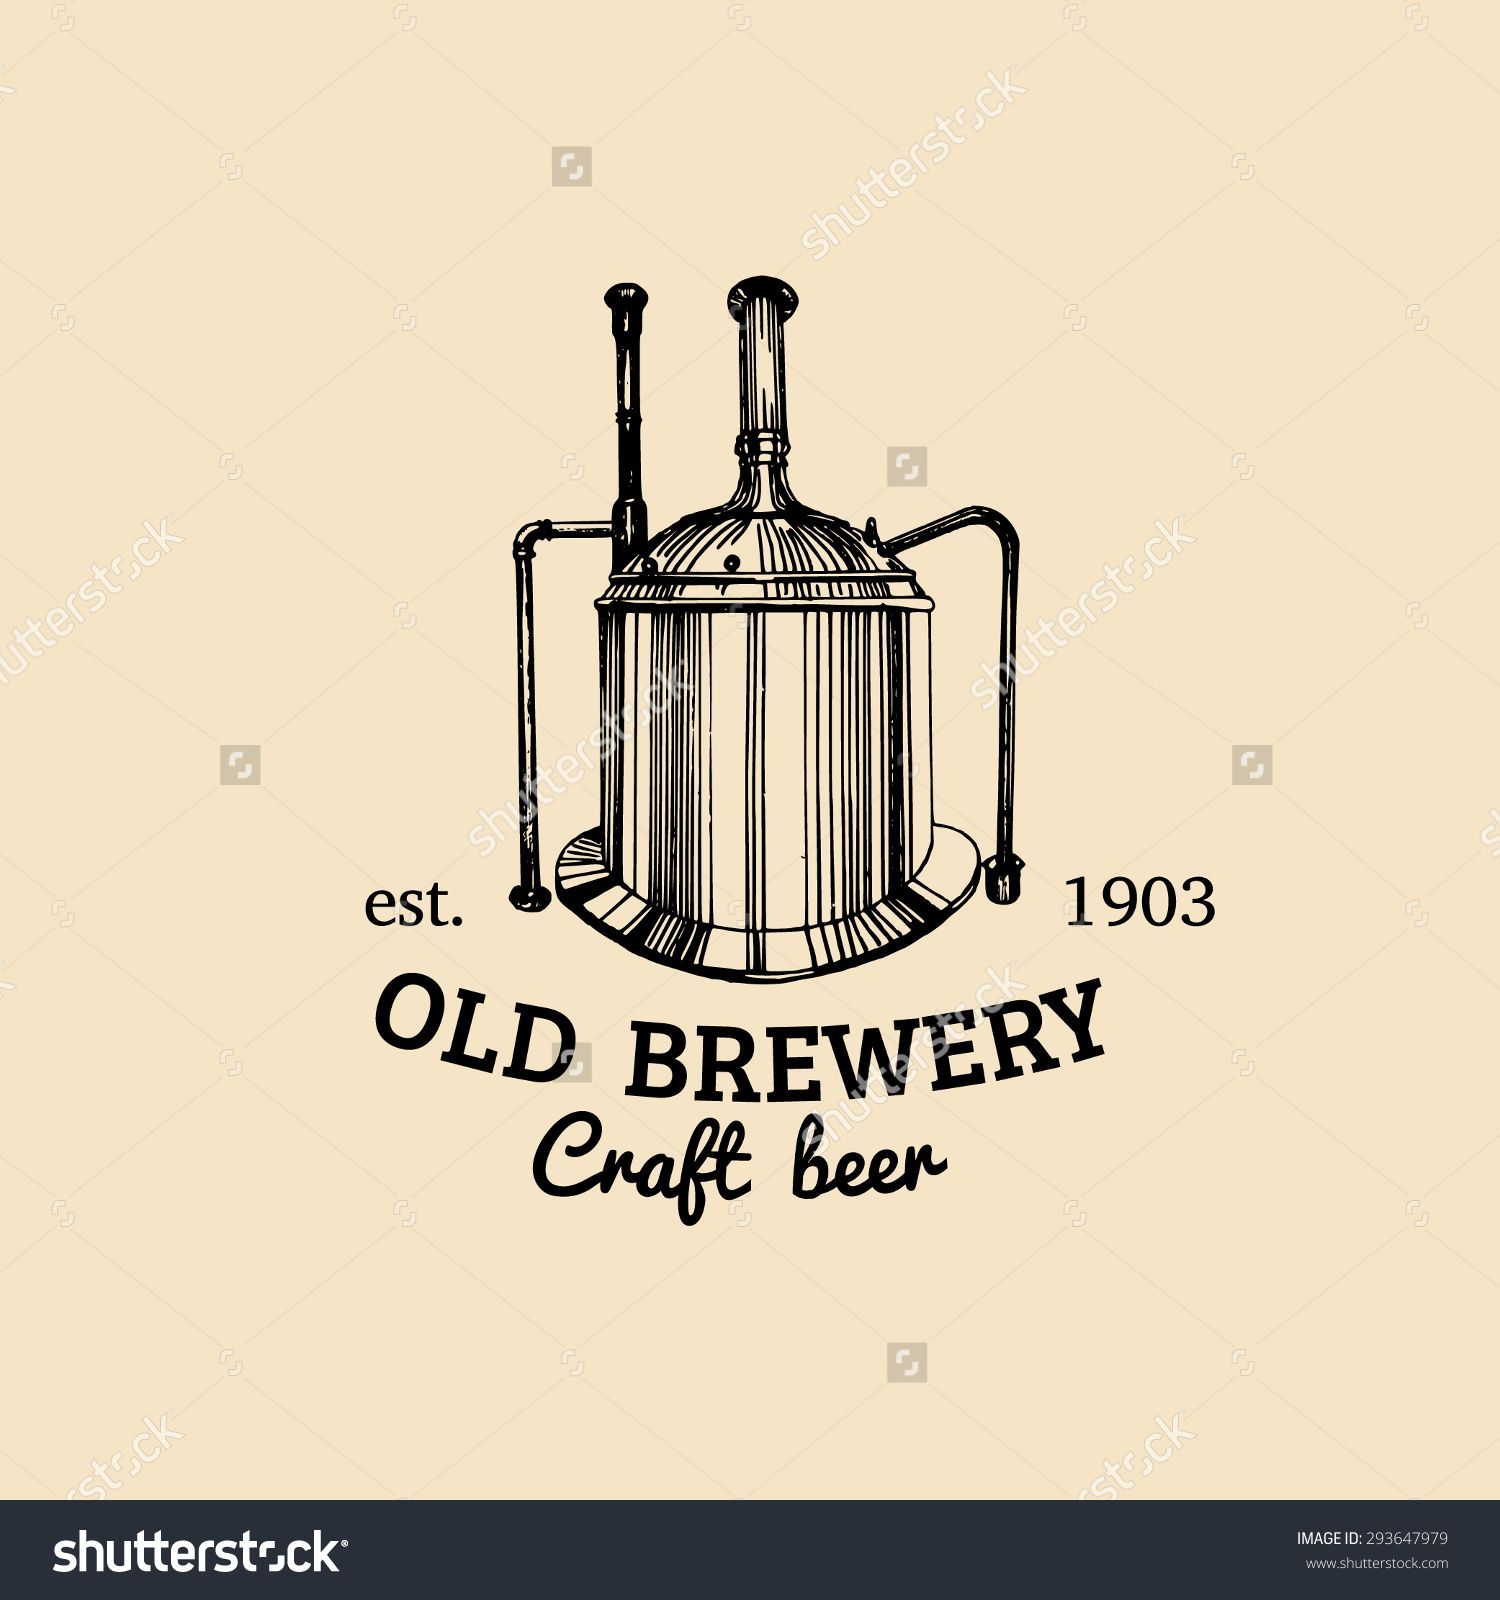 brew kettle old brewery beer labels brewery sketch